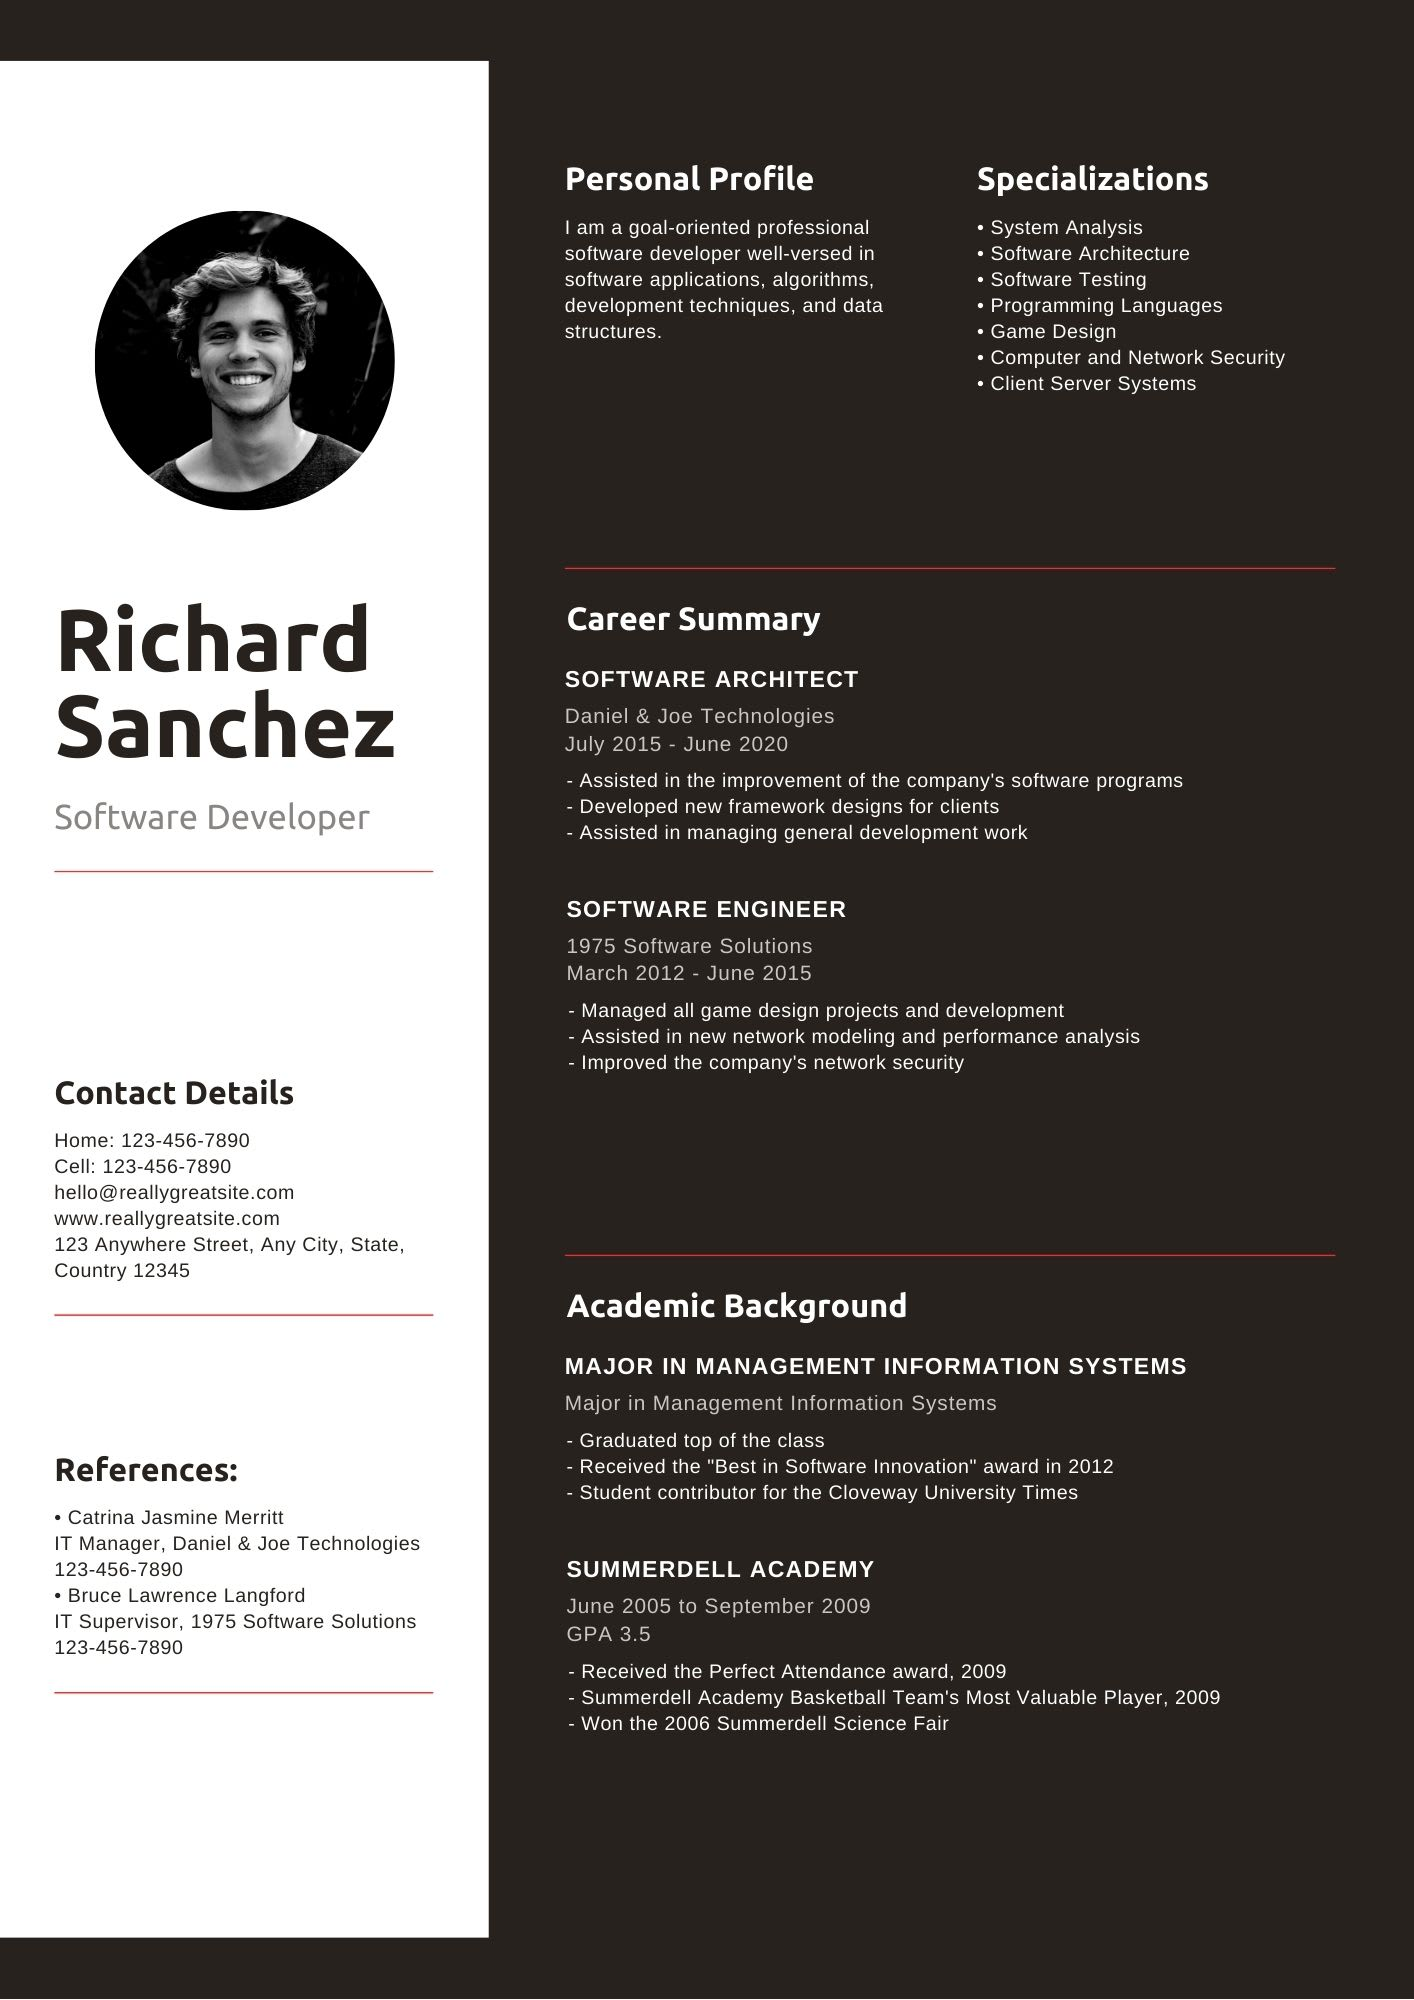 Design A 3 Professional Resume Cover Letter Template By Paulsprejan Fiverr